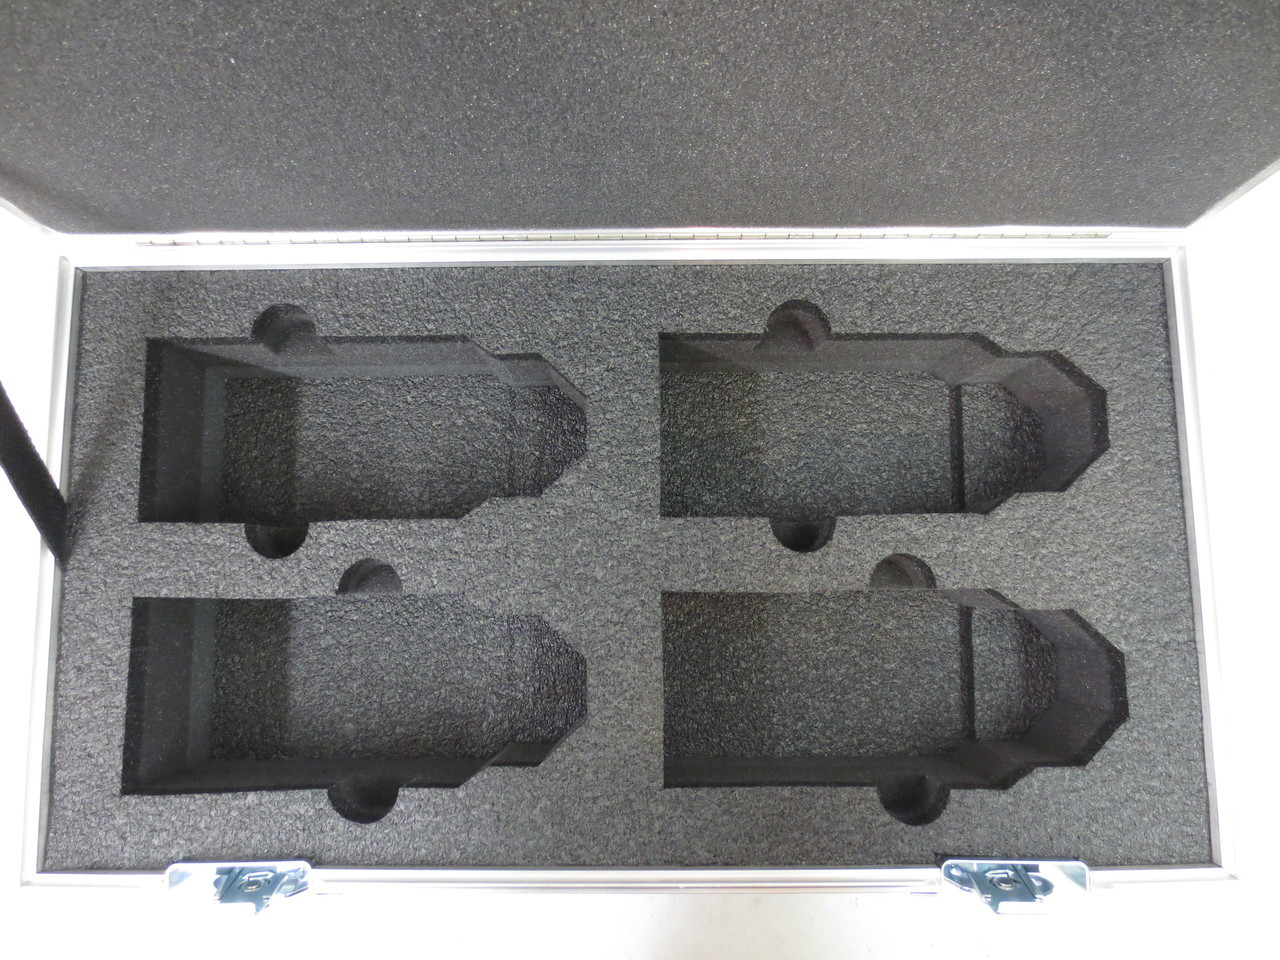 ARRI Master Anamorphic Lens (4 Horizontal)